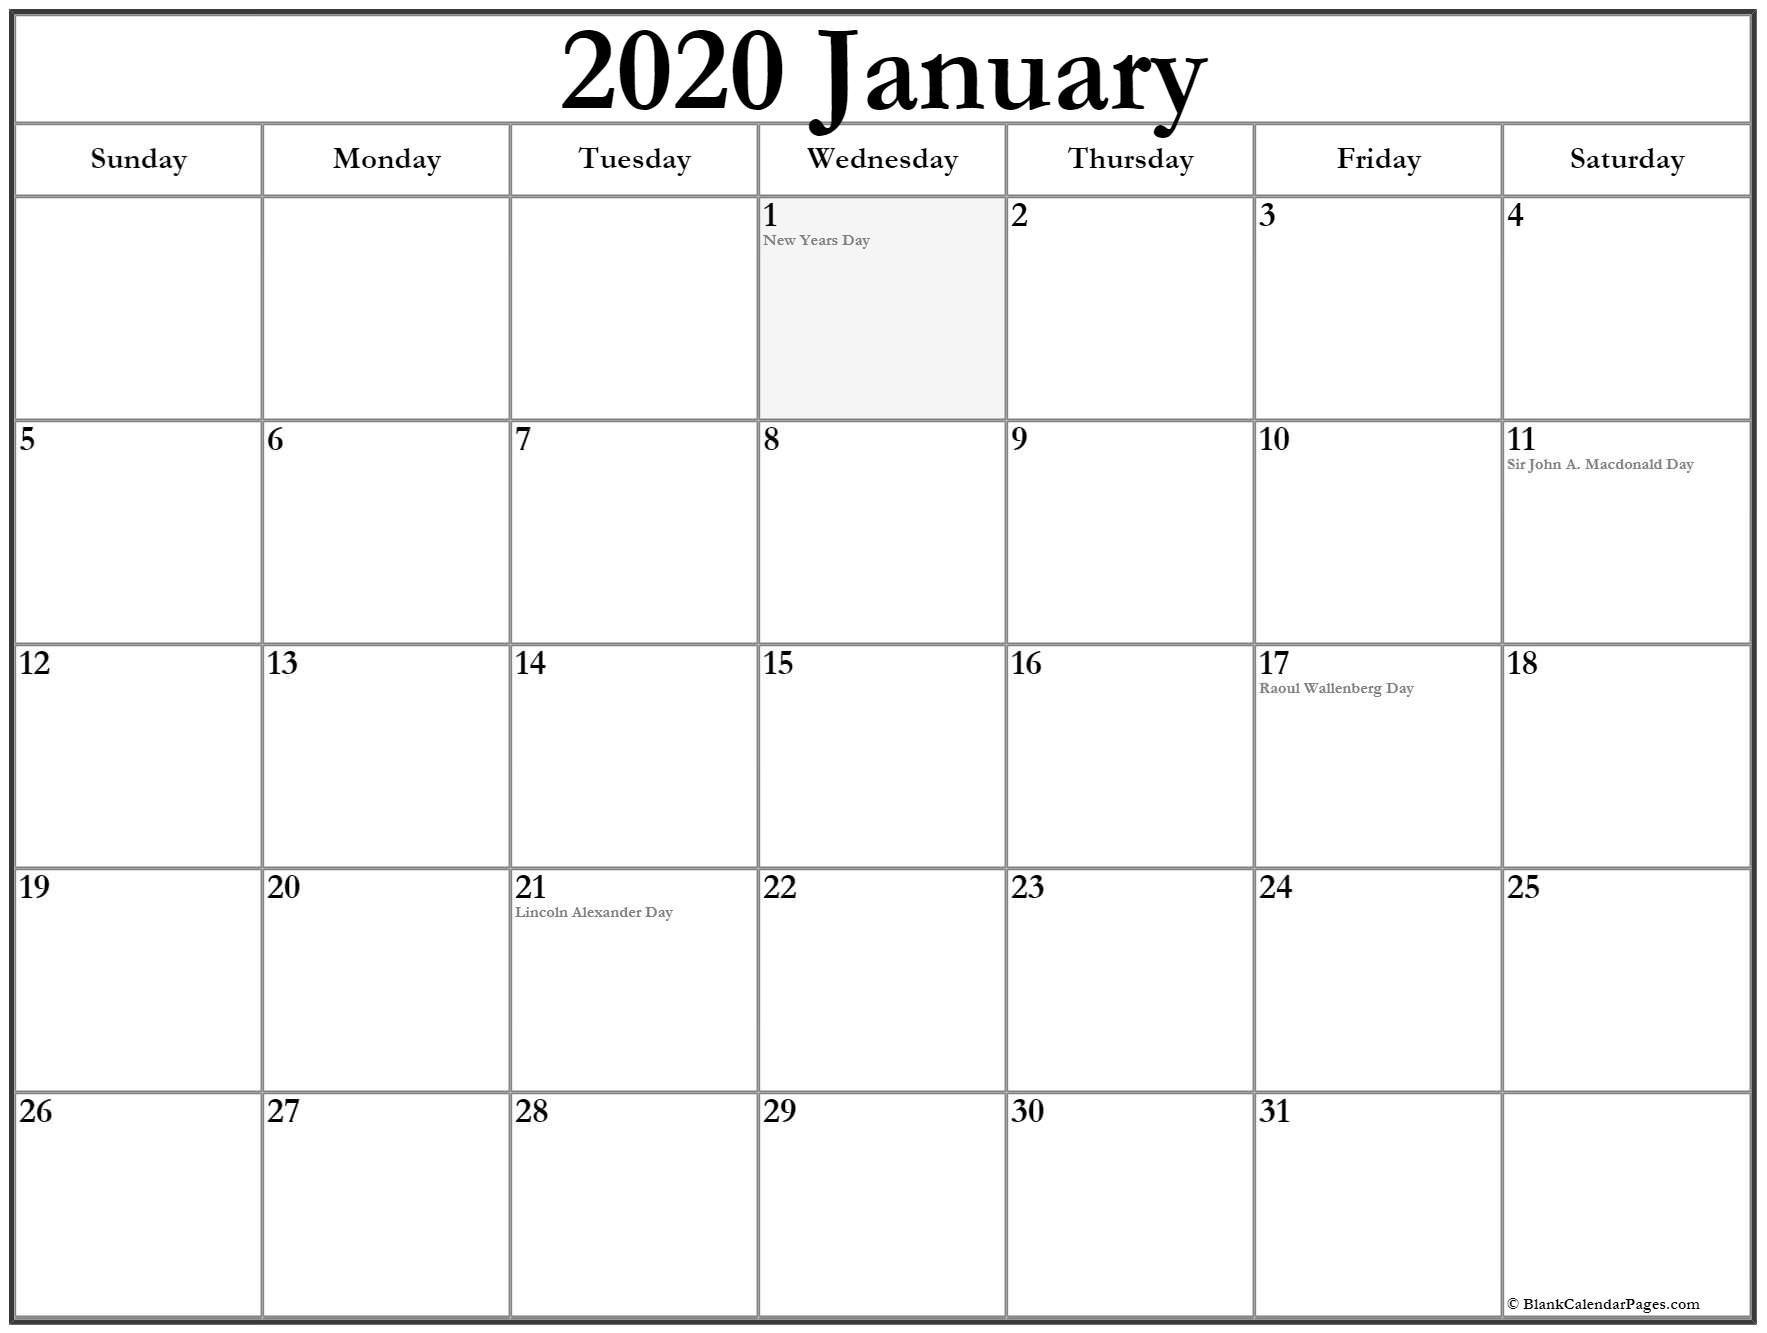 January 2020 Calendar With Holidays | Holiday Calendar in Free Printable 2020 Canadian Calendar